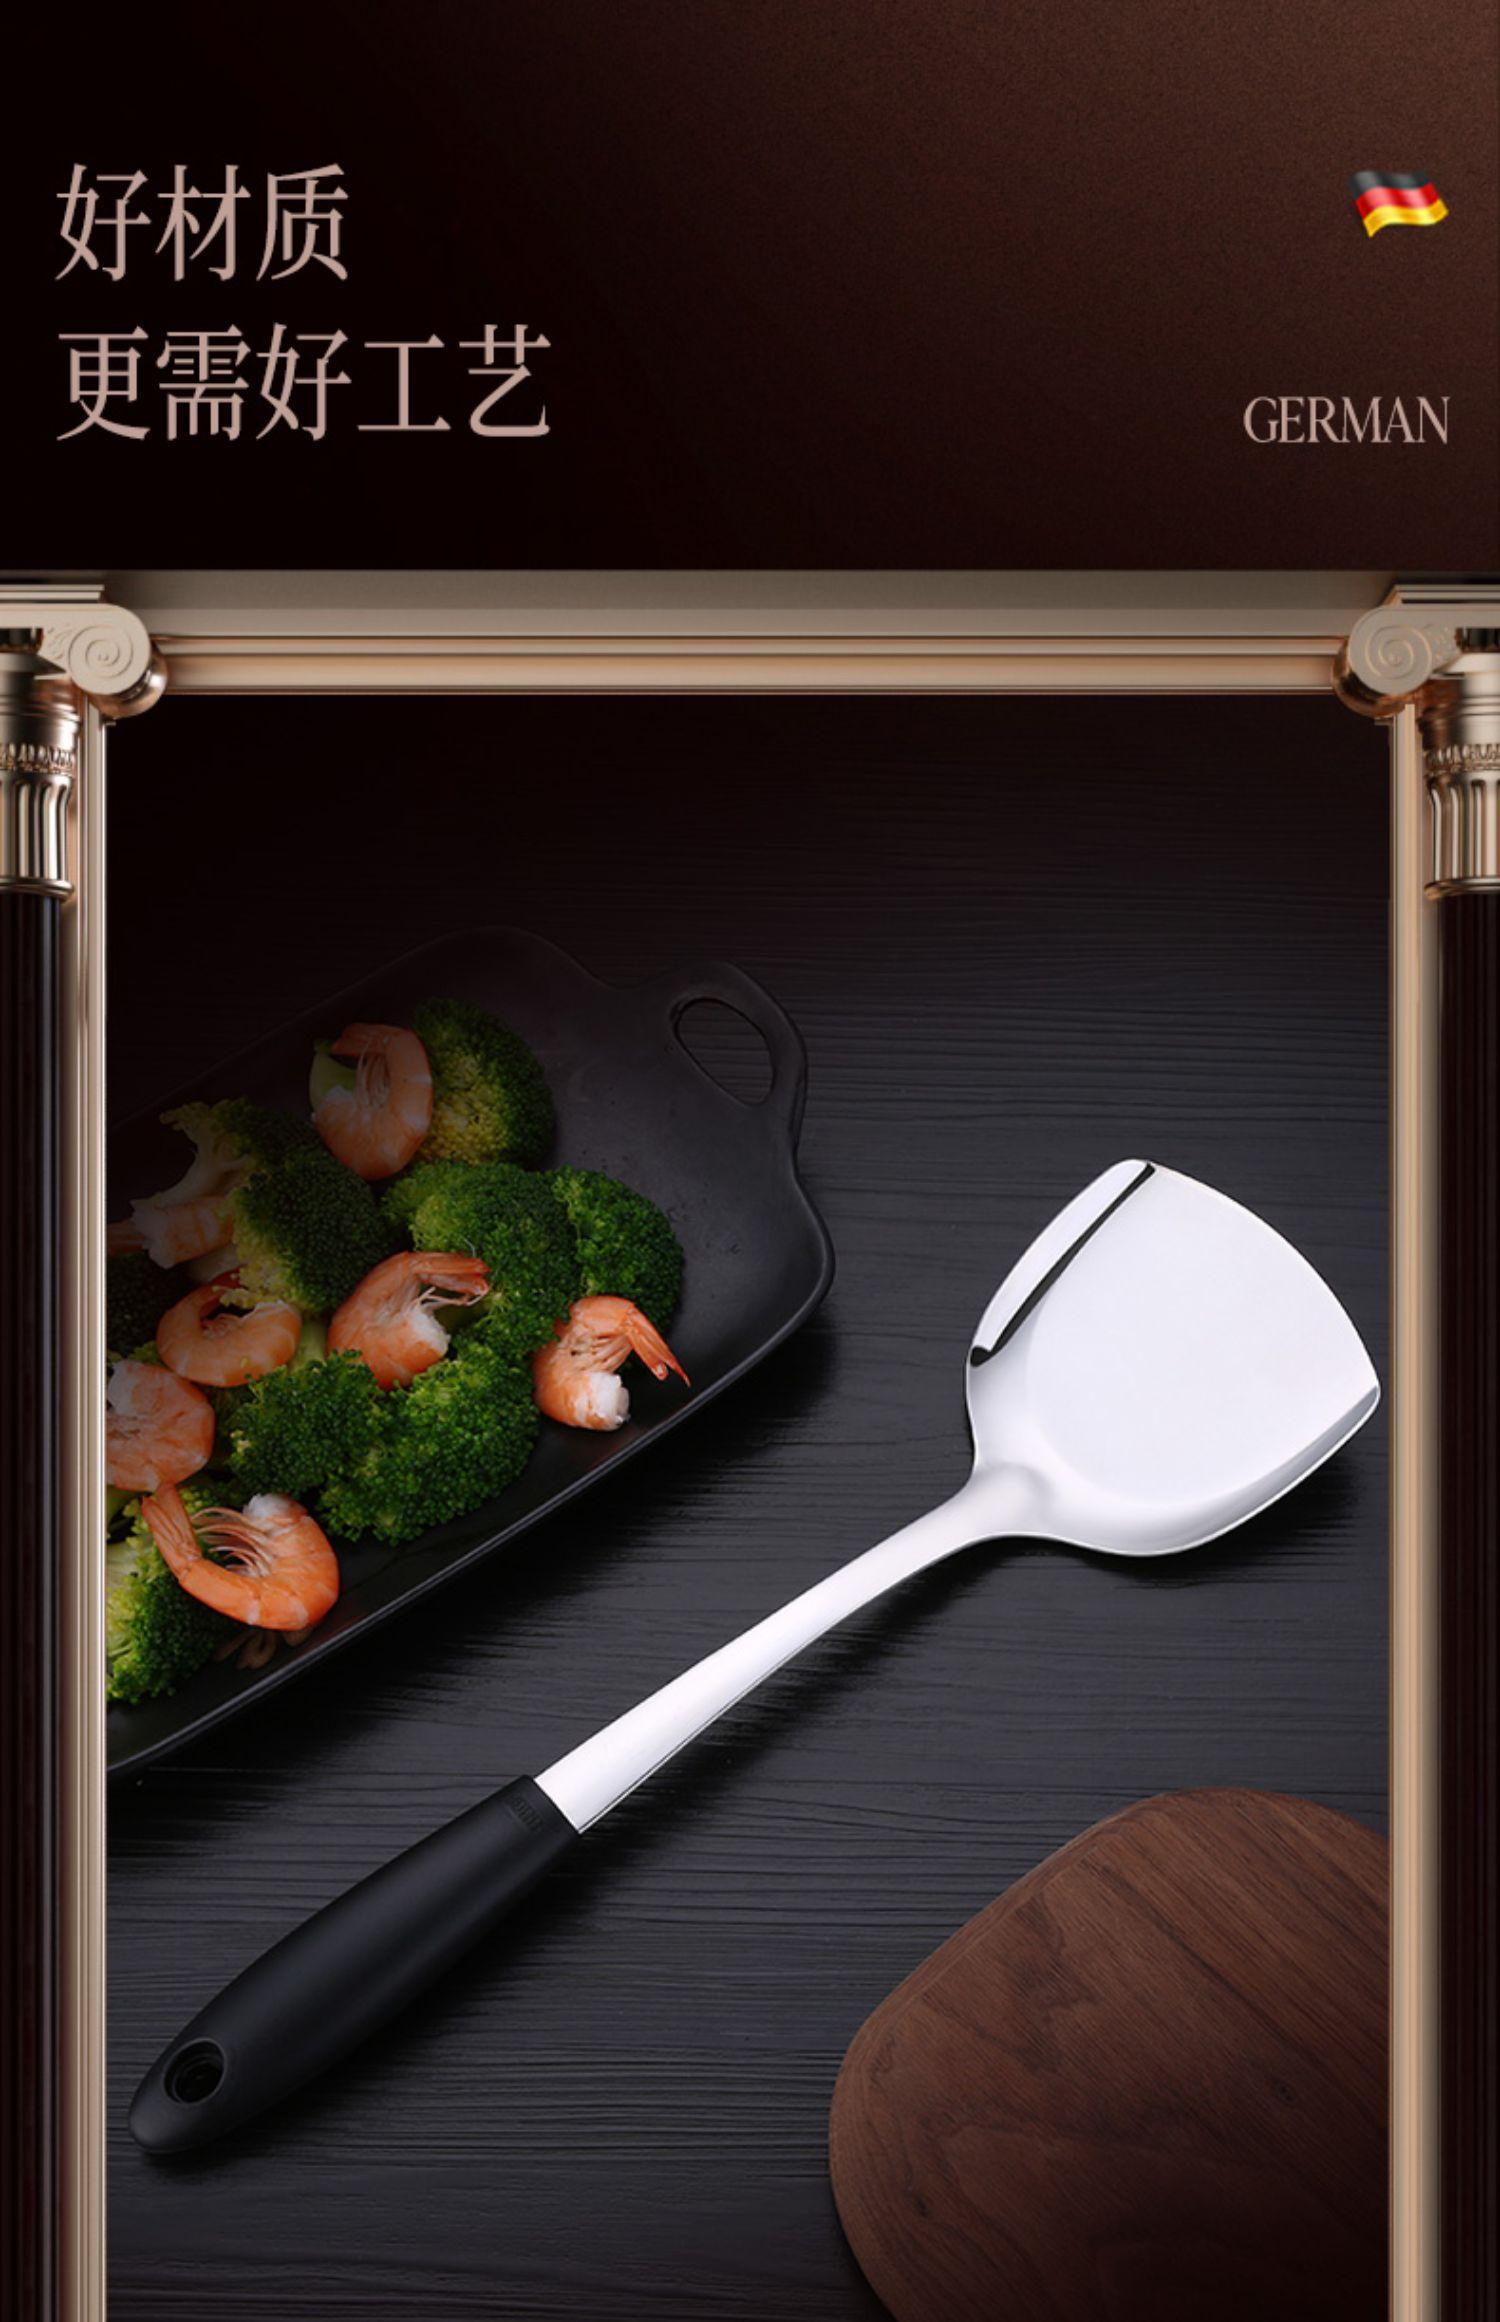 SSGP 德国304不锈钢大汤勺家用火锅勺子盛粥汤勺厨房加厚长柄大号商品详情图